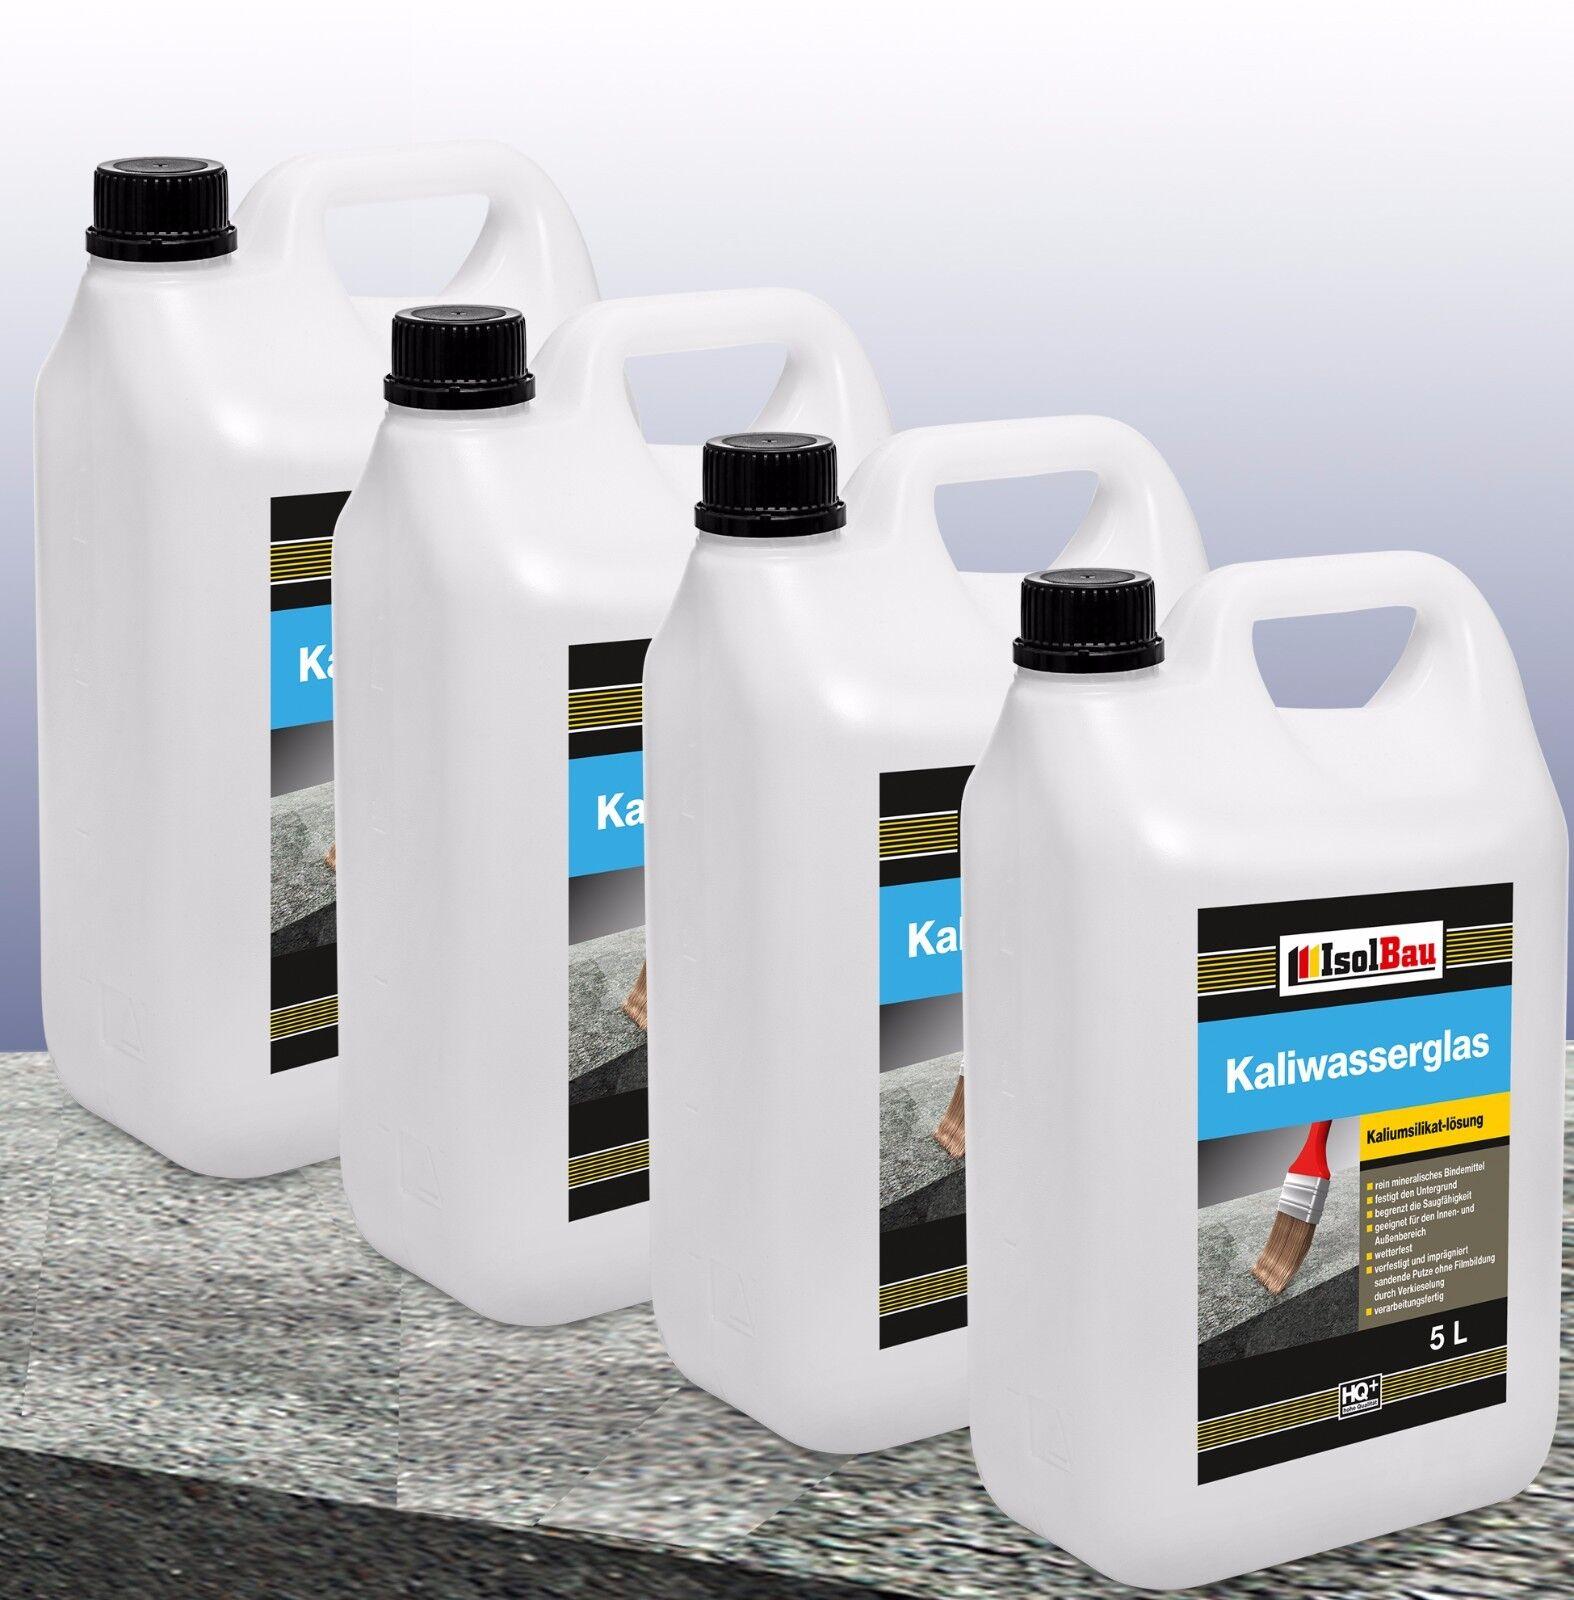 20 Liter Profi Kaliwasserglas Oberflächen Grundierung Konservierung altbewährt